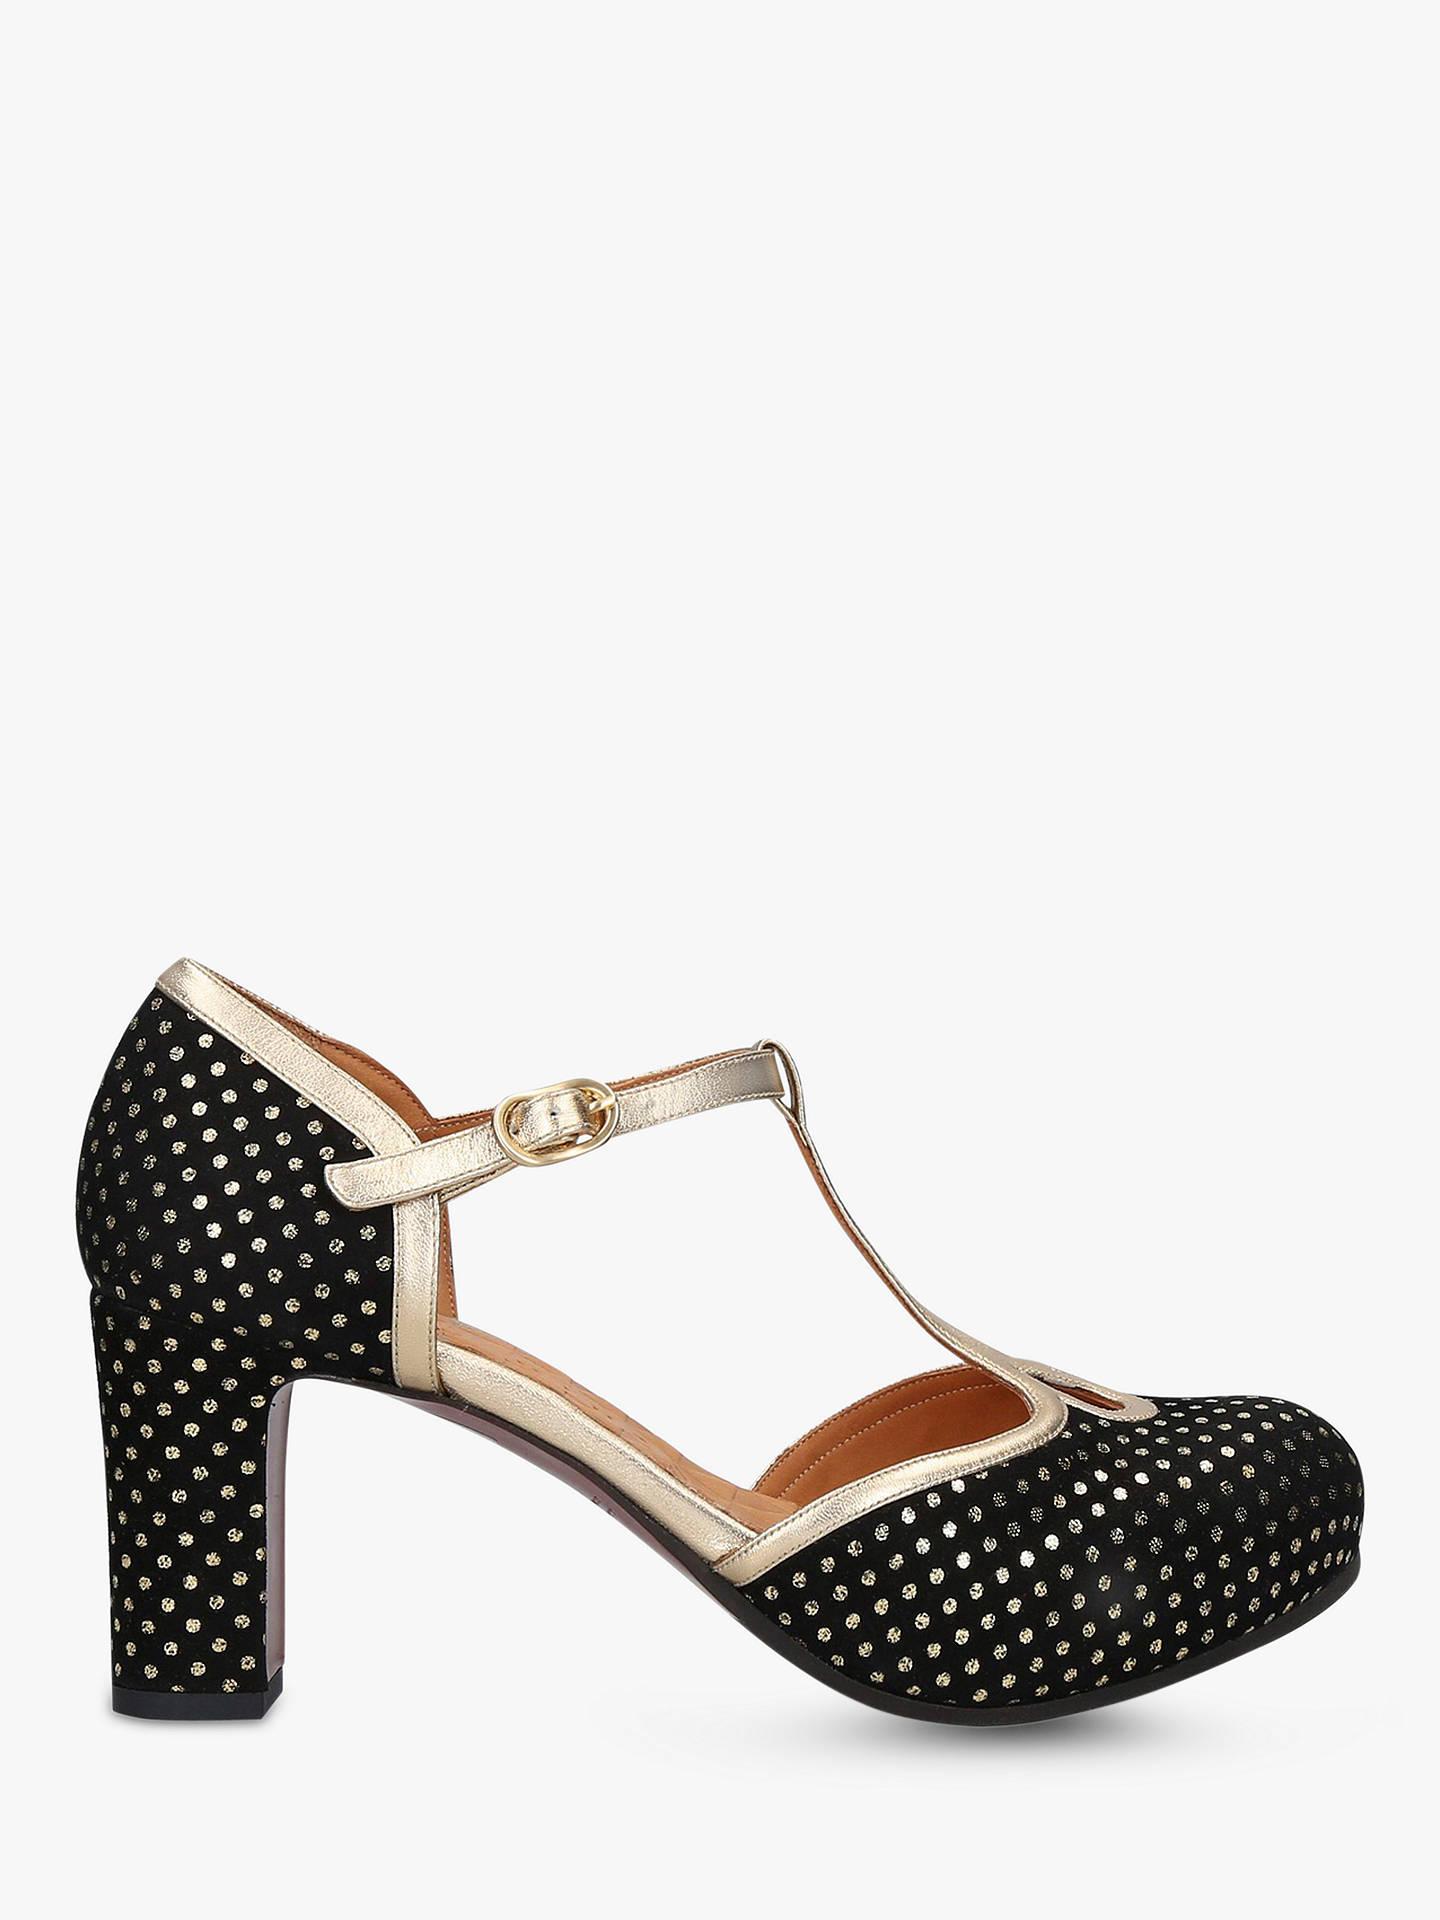 ad5eff598581 Chie Mihara Ibis Spot Pattern Block Heel Court Shoes, Black/Gold